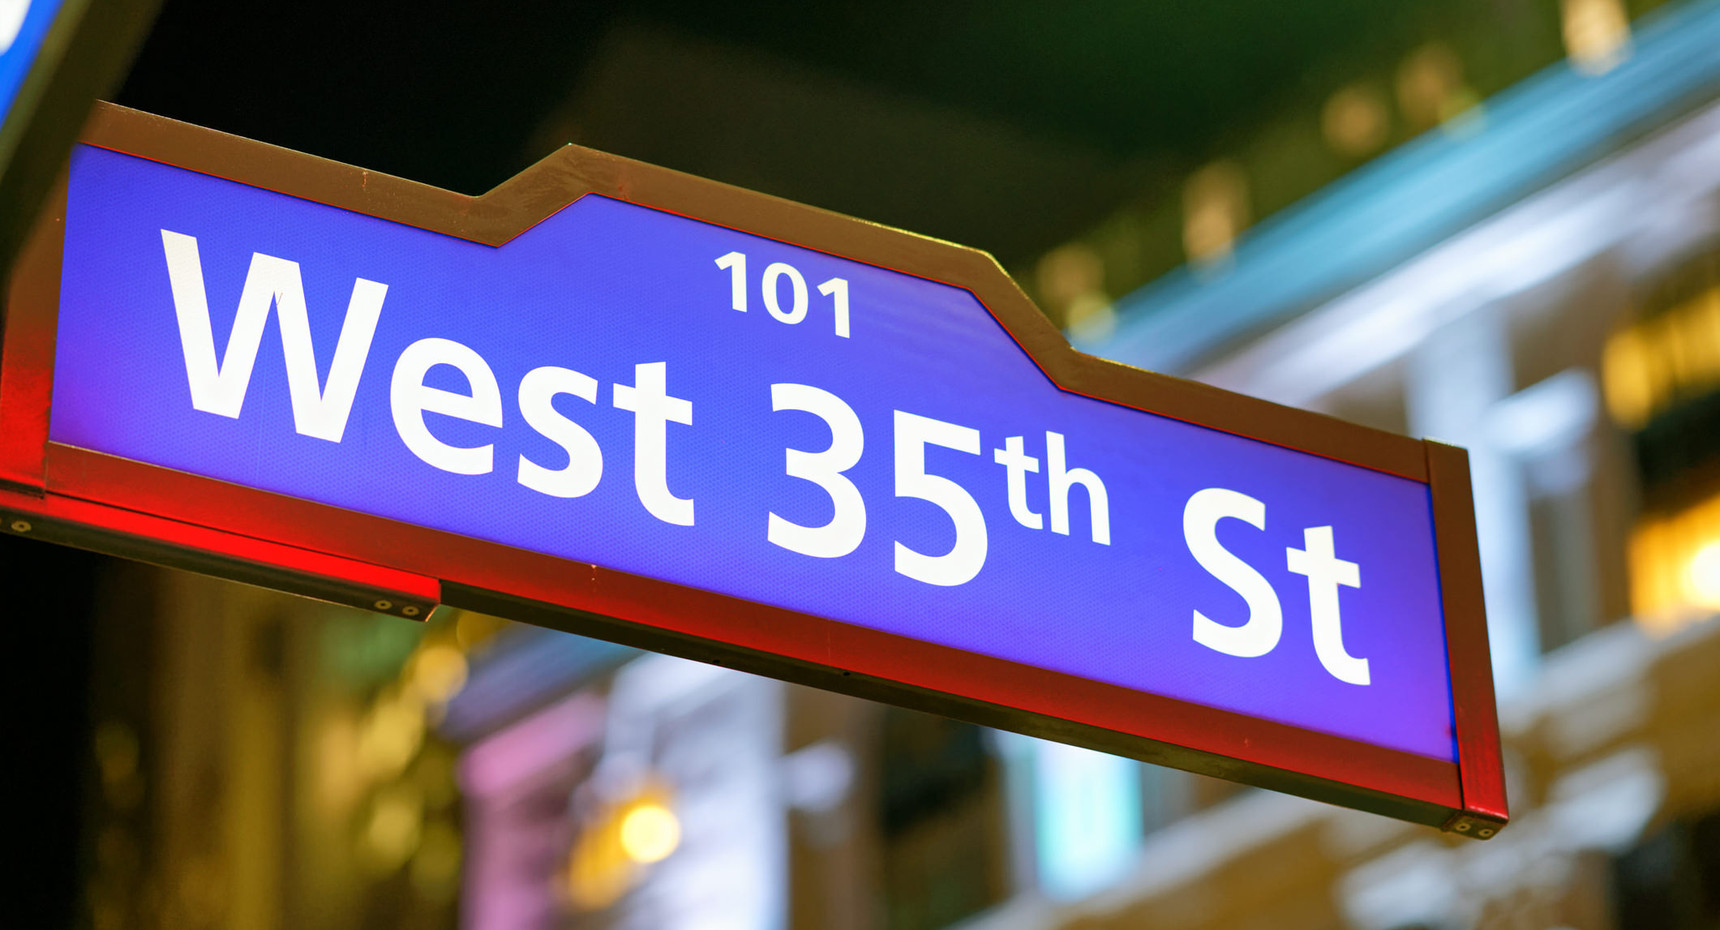 35th Street sign at night